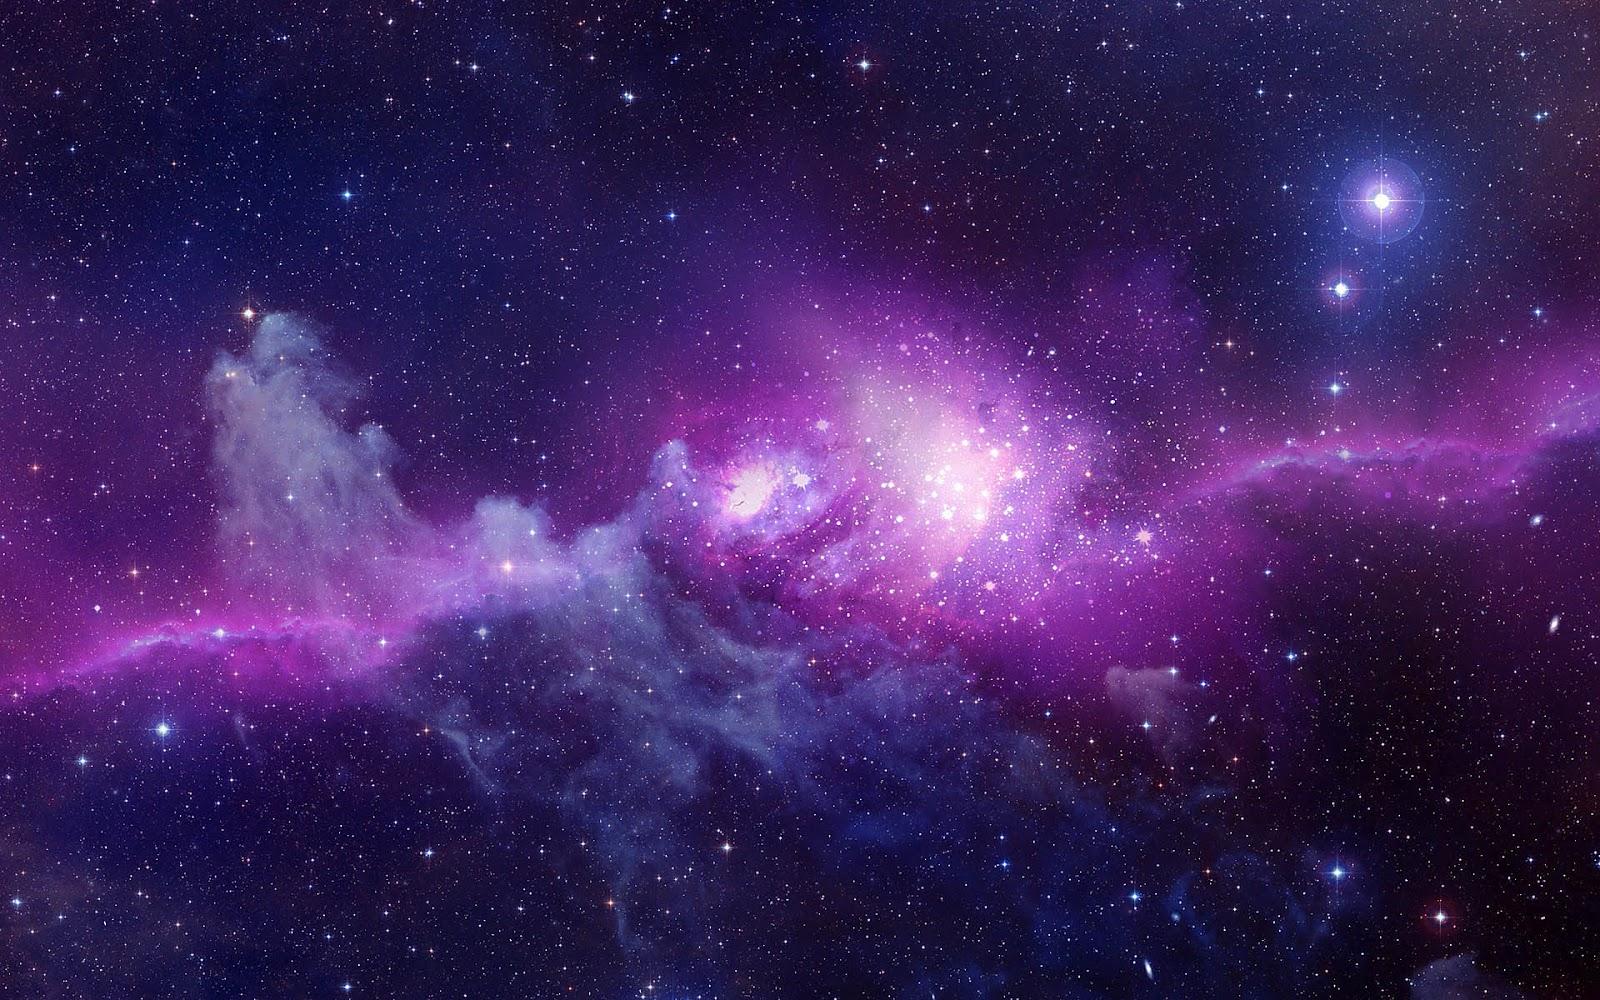 galaxy wallpaper hd 8175 8506 hd wallpapers